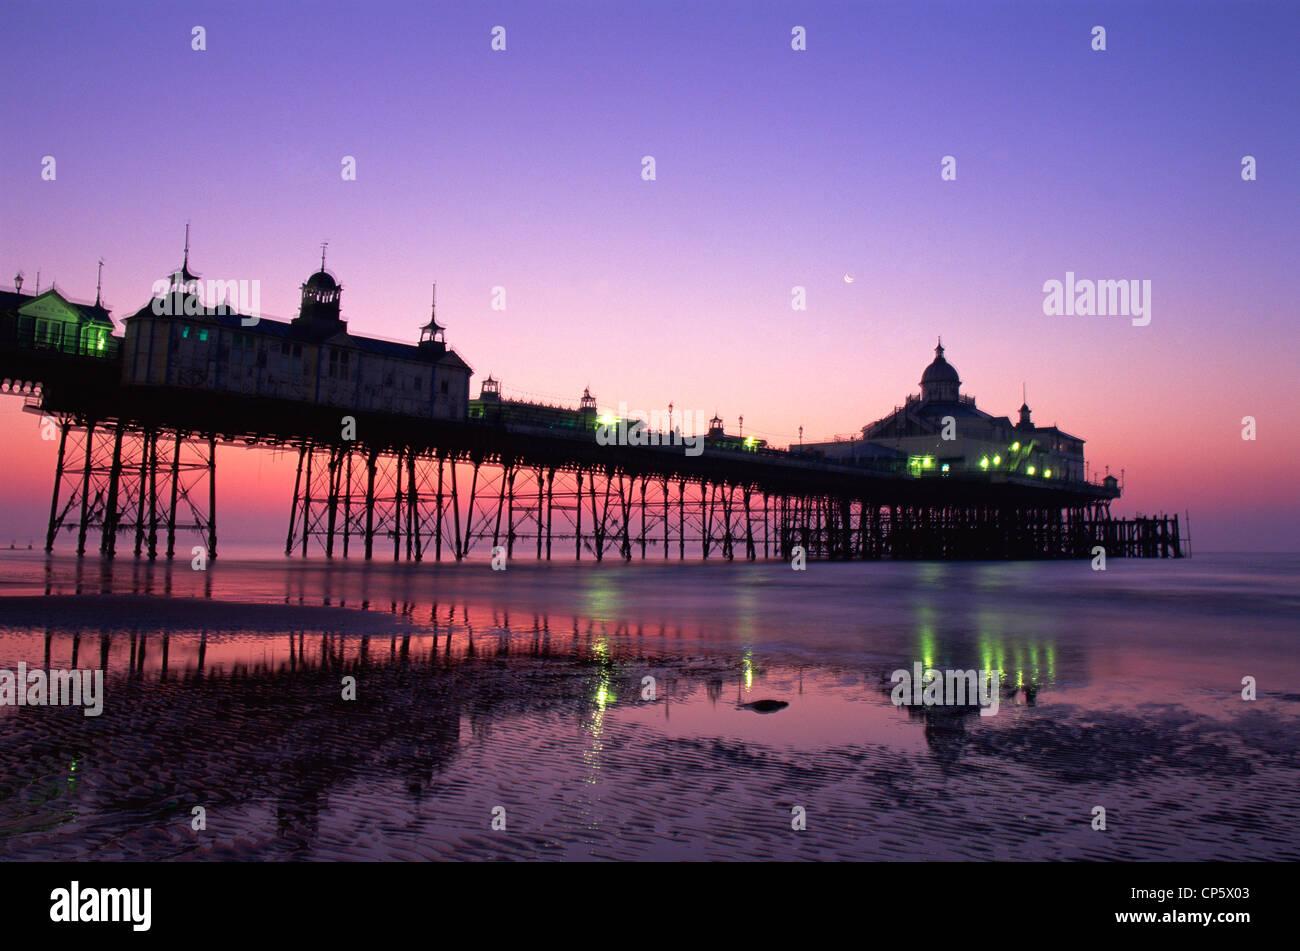 England, Sussex, Eastbourne, Eastbourne Pier - Stock Image